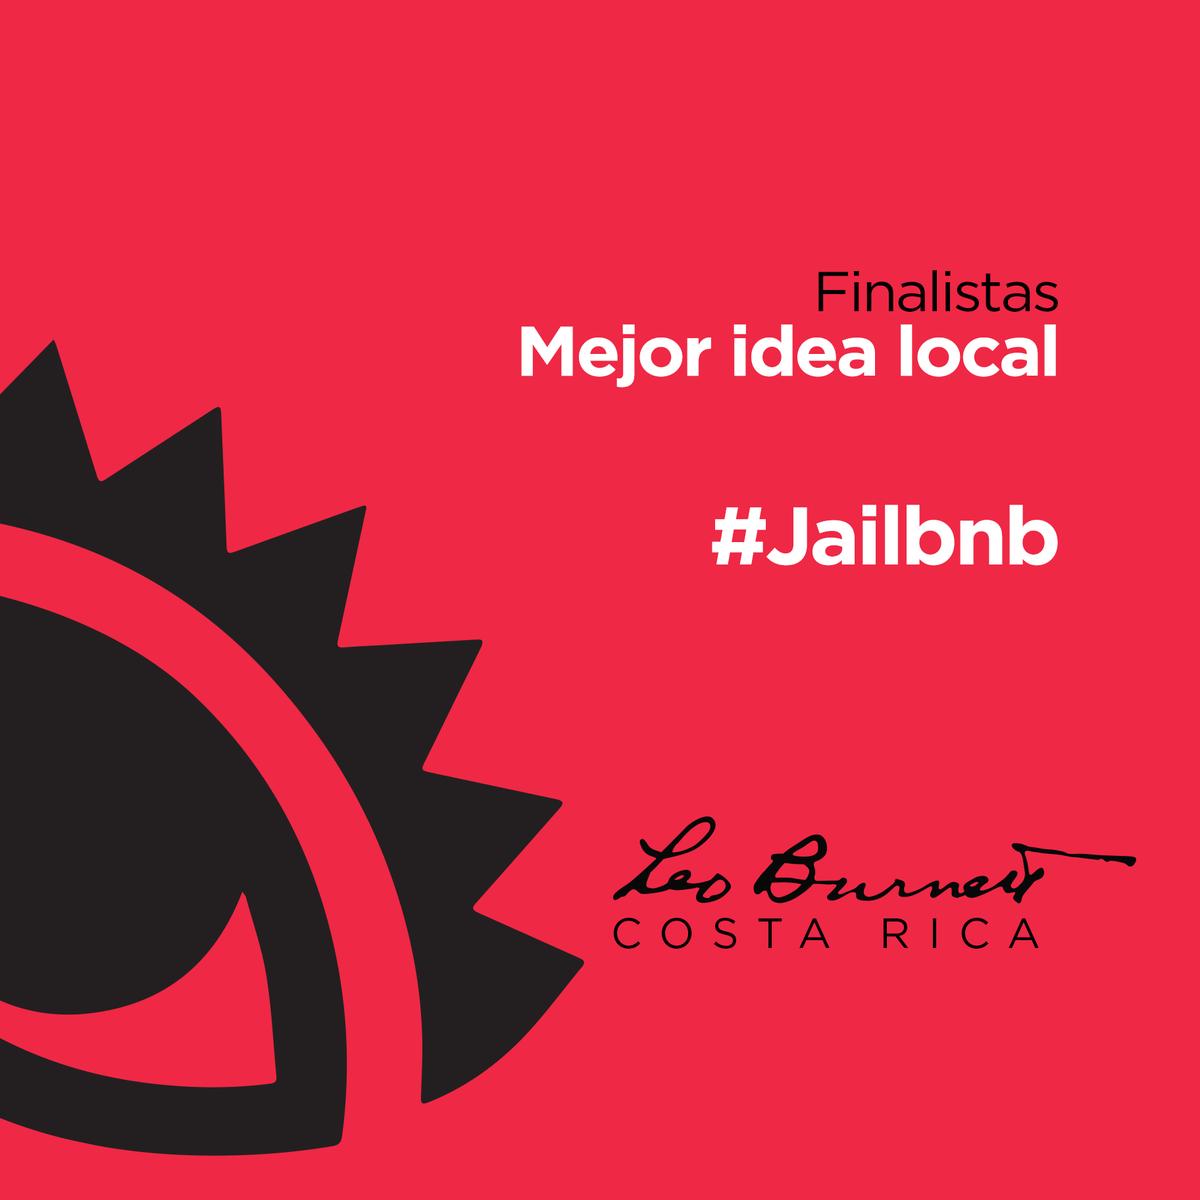 #Jailbnb entre las mejores ideas de Centroamérica y Caribe en el #ElOjo2015 https://t.co/EyIlSnRtm9 #LeoBurnettCR https://t.co/Zv7xmP64aJ